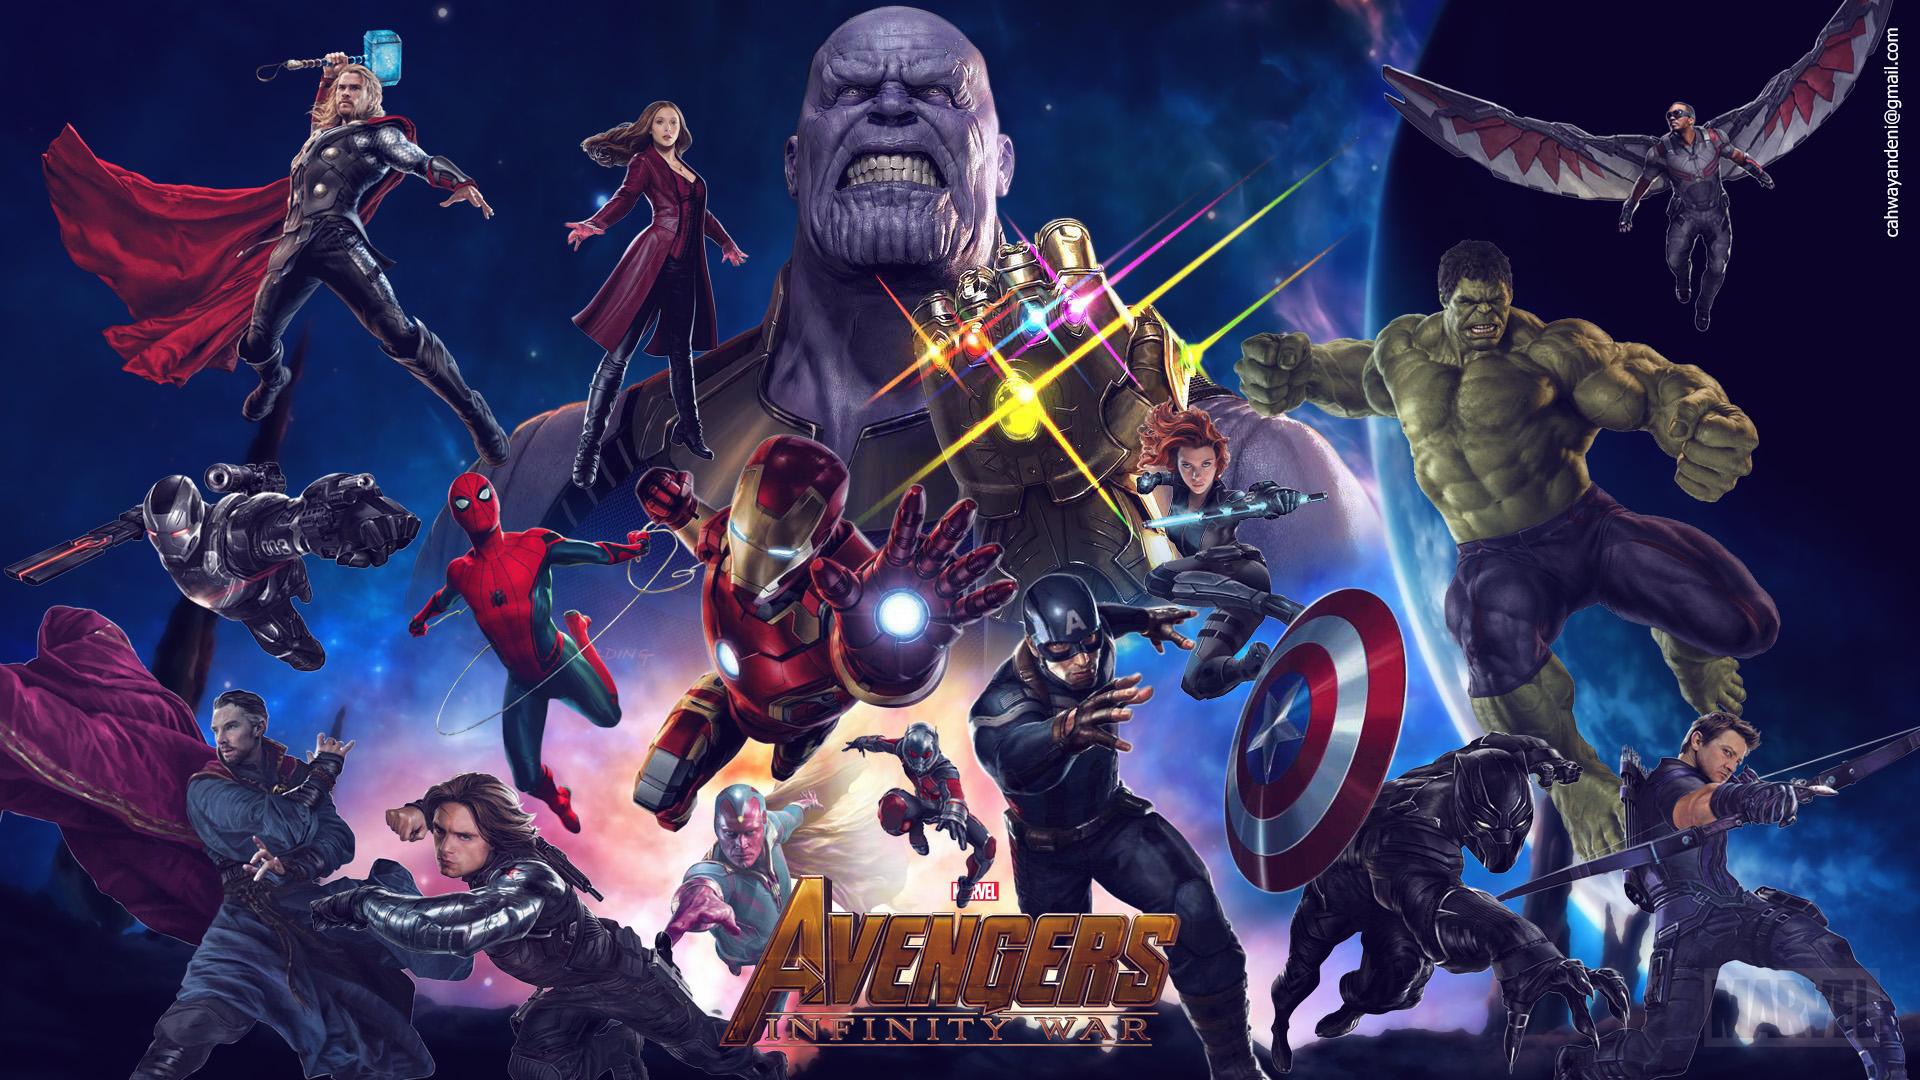 1152x864 Avengers Infinity War 2018 Movie 1152x864